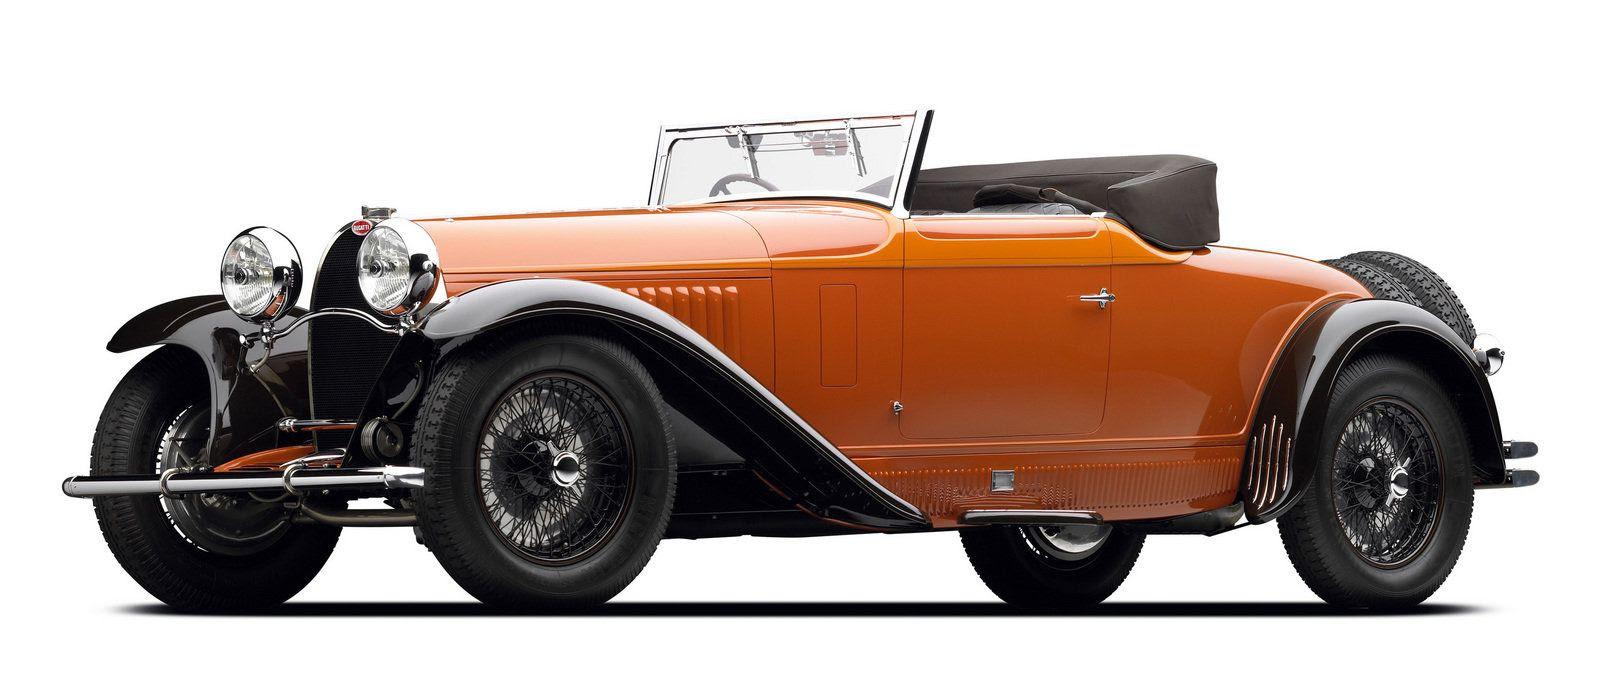 The Art Of Bugatti Exhibit Coming To The Mullin Automotive ...